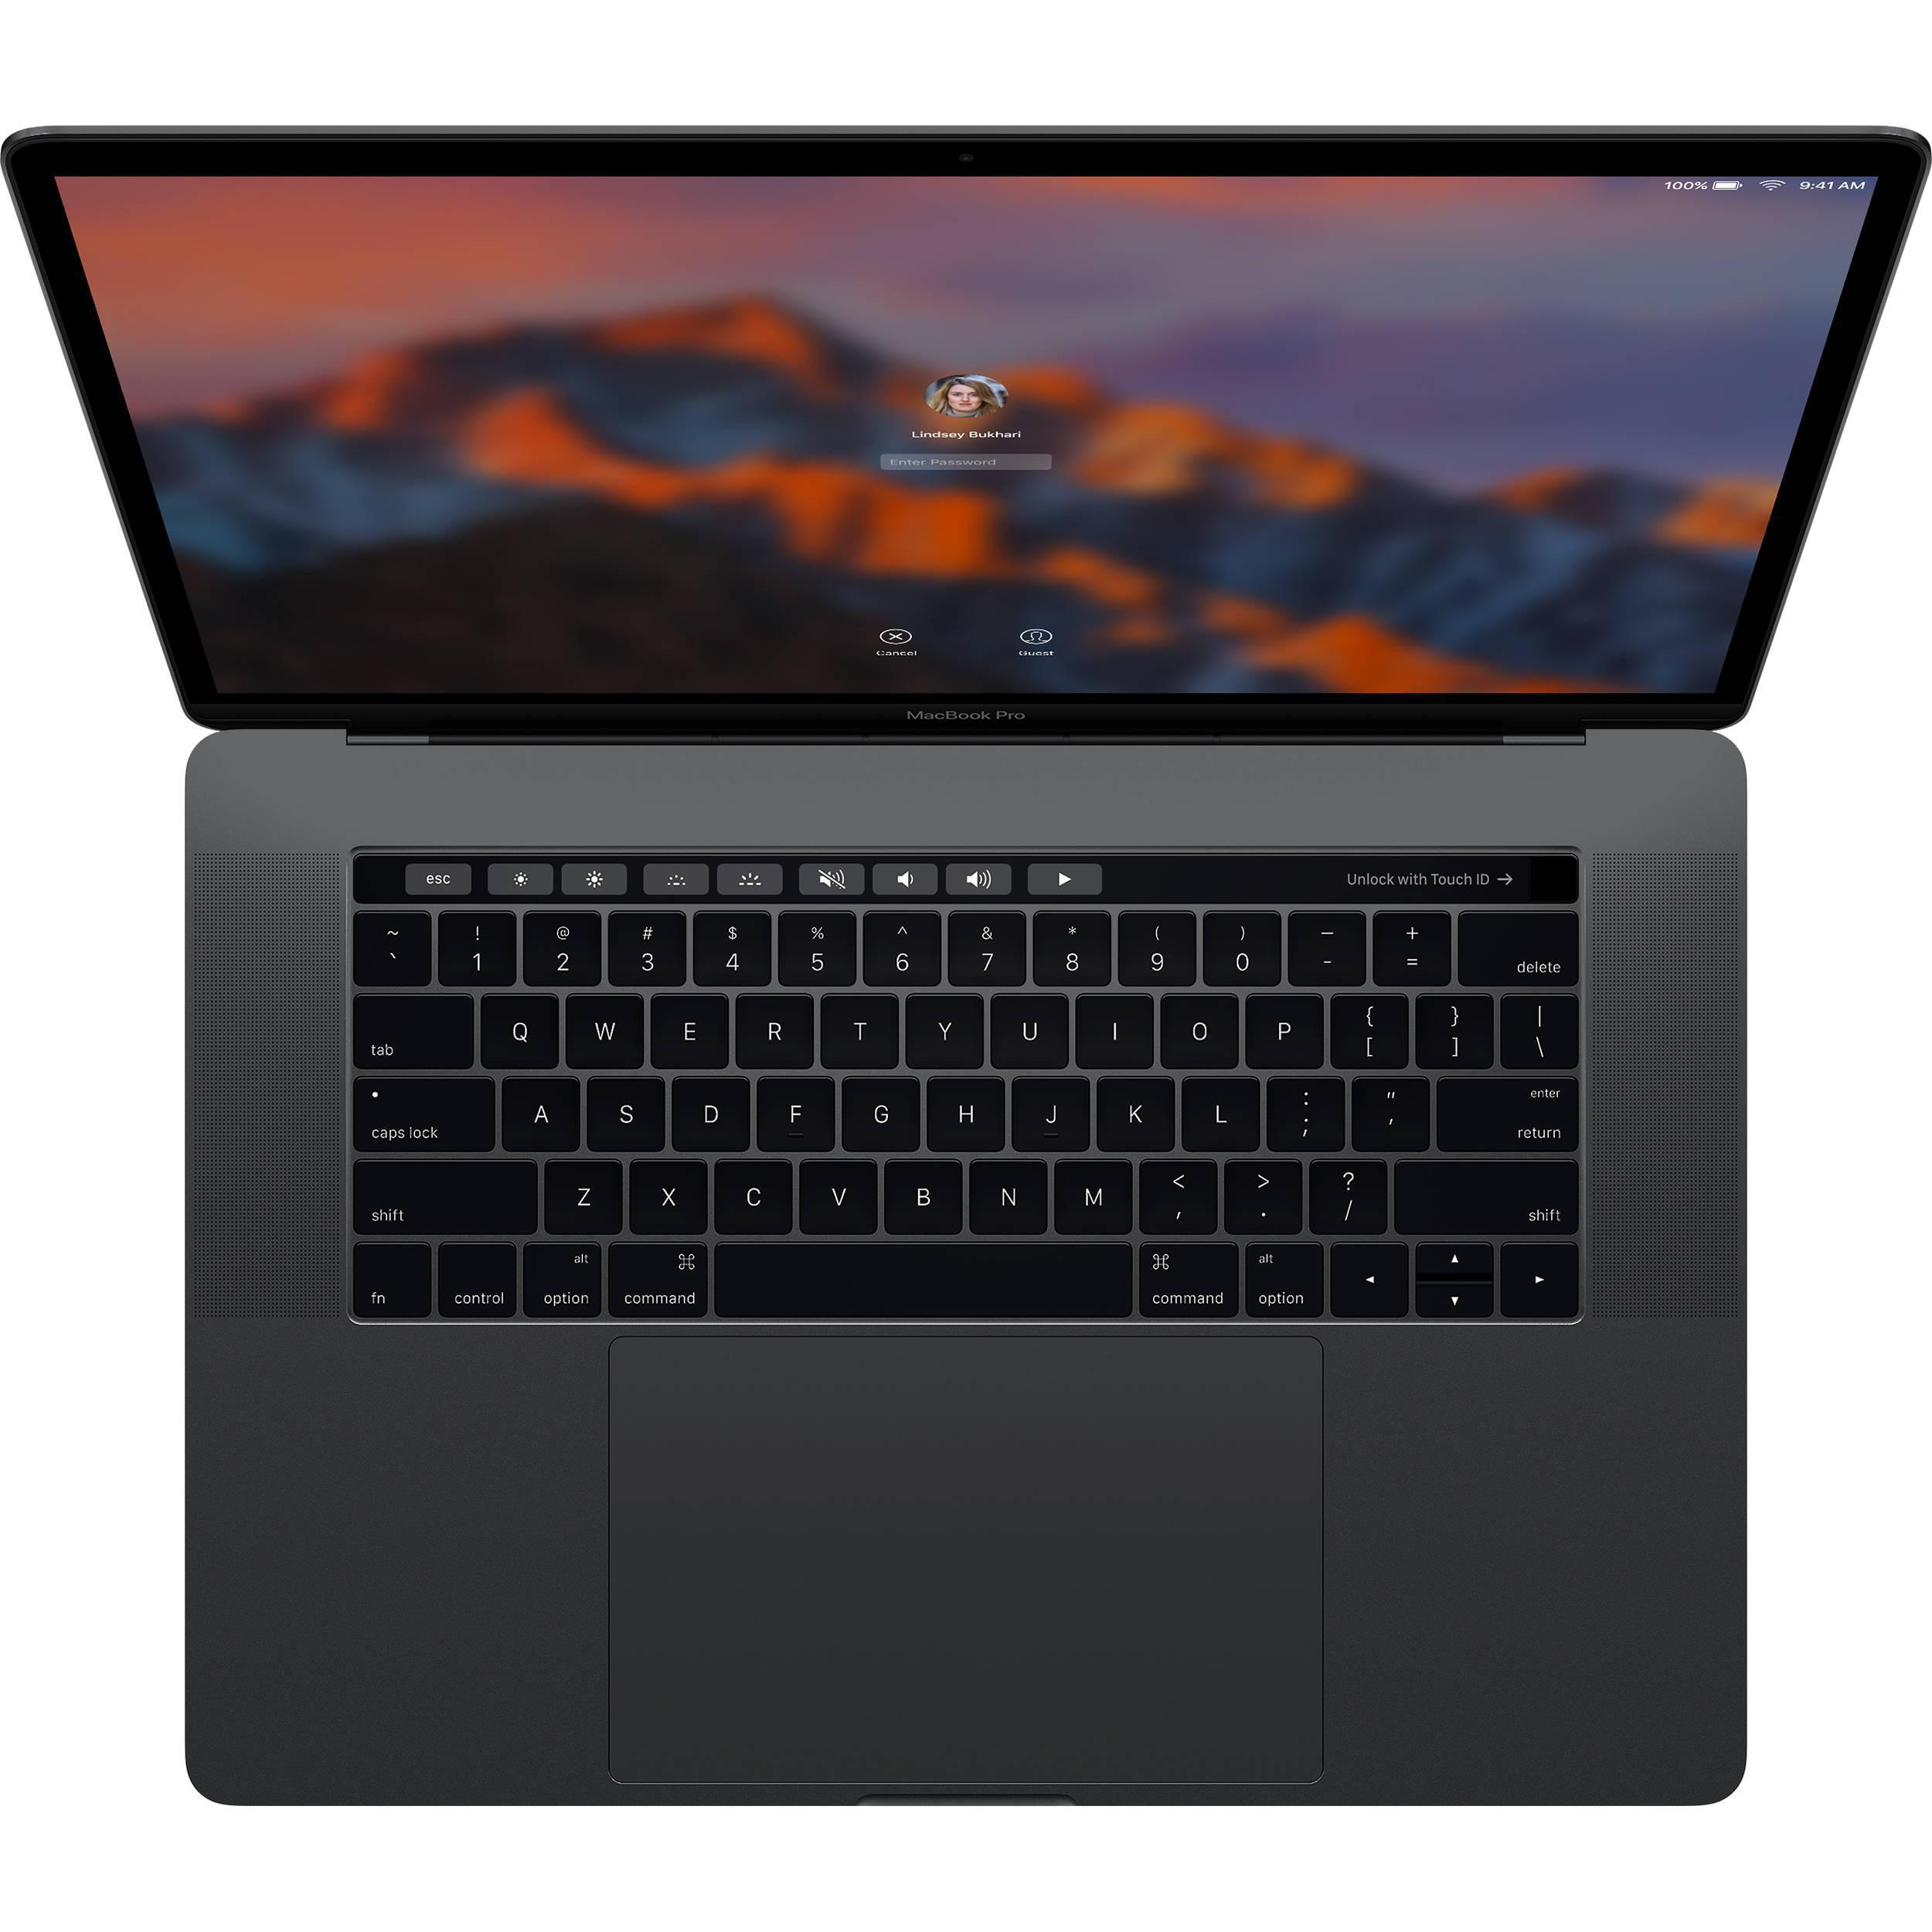 MacBook Pro Retina 15.4-inch (2019) - Core i7 - 16GB - SSD 512 GB